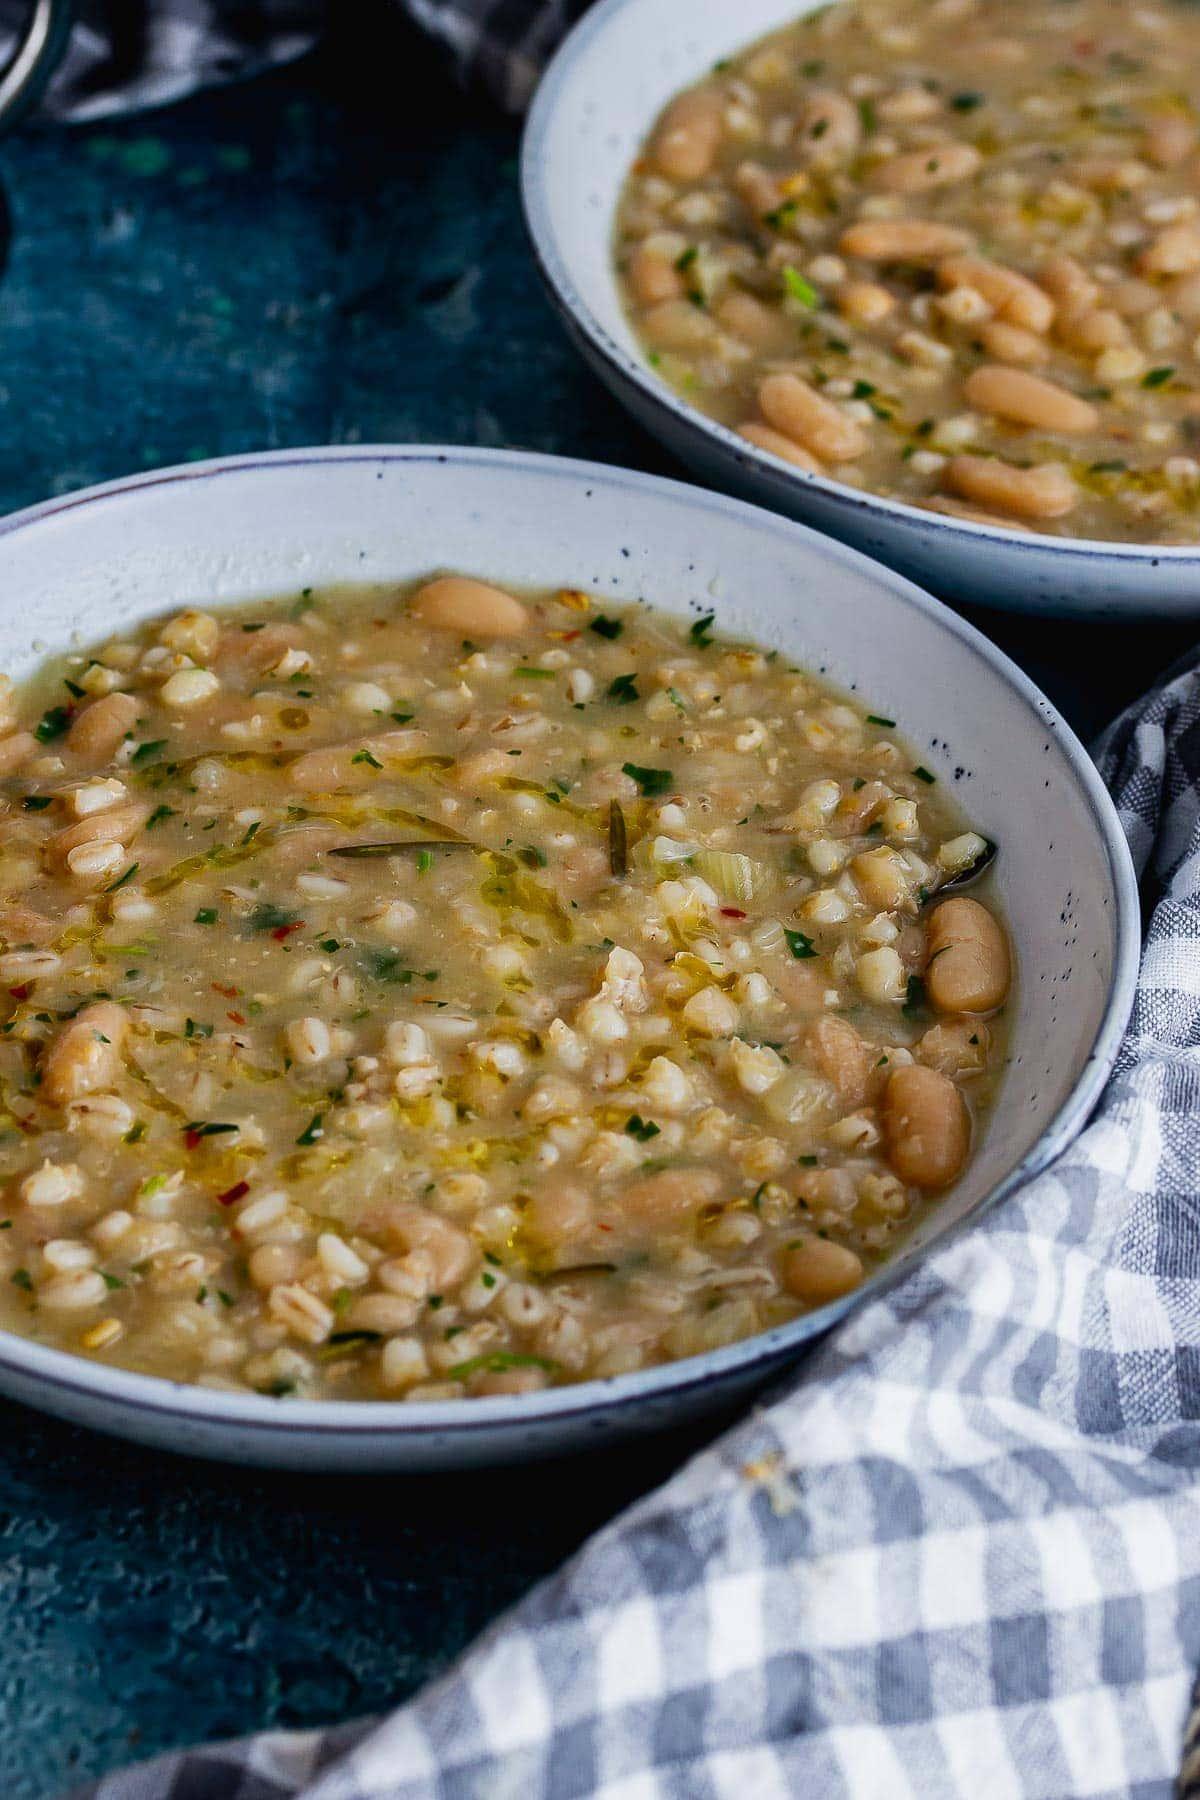 Blue bowl of bean and barley soup